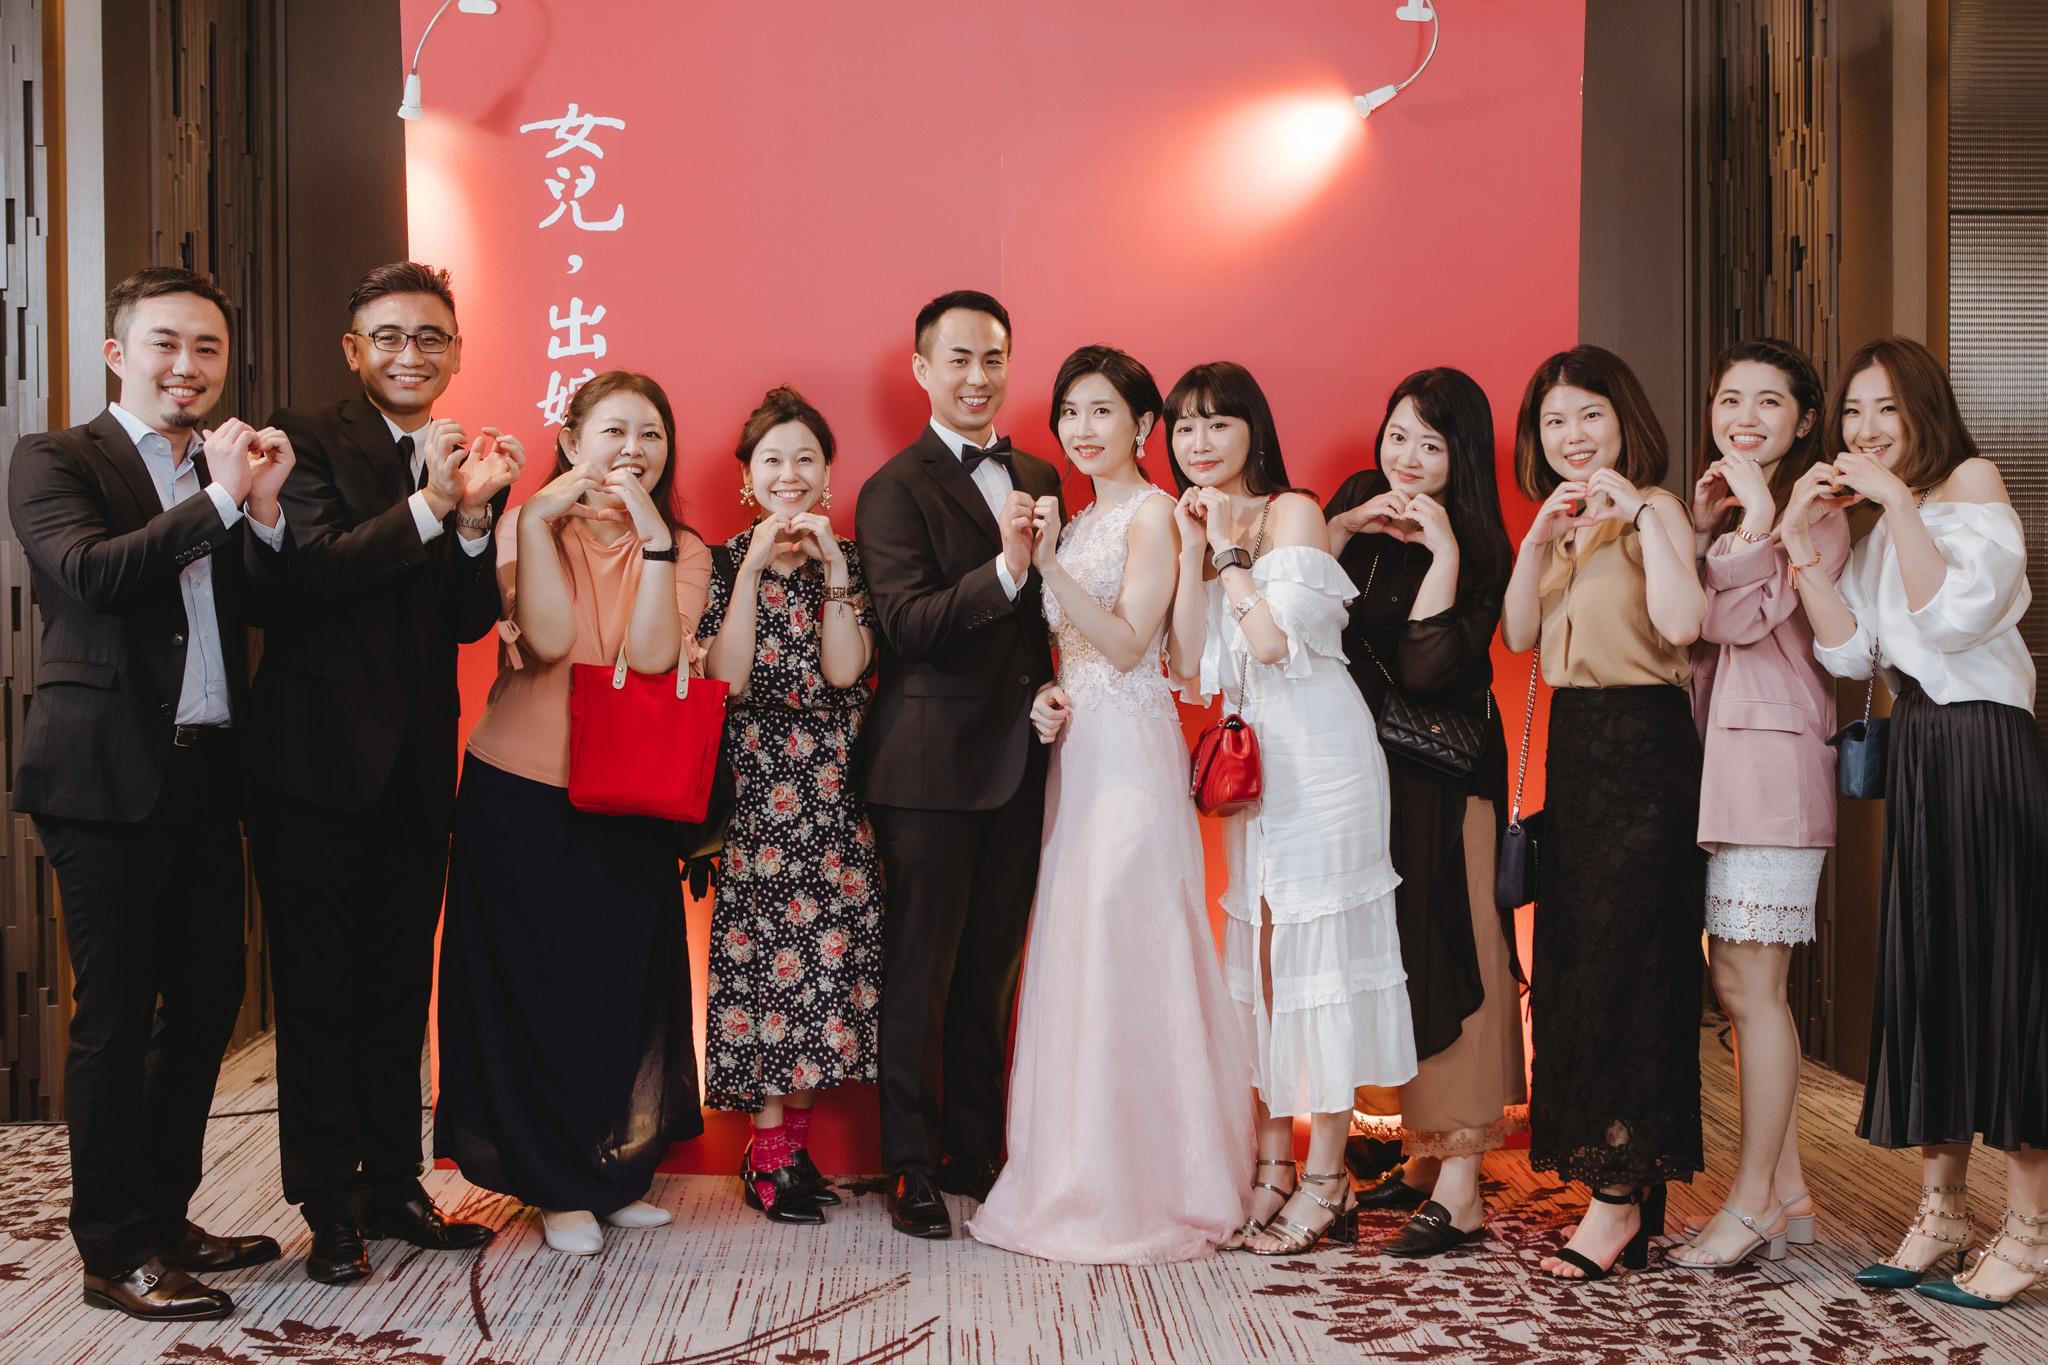 EW 居米 台北禮服 台北婚紗 台北婚攝 國泰萬怡 台北婚禮-44